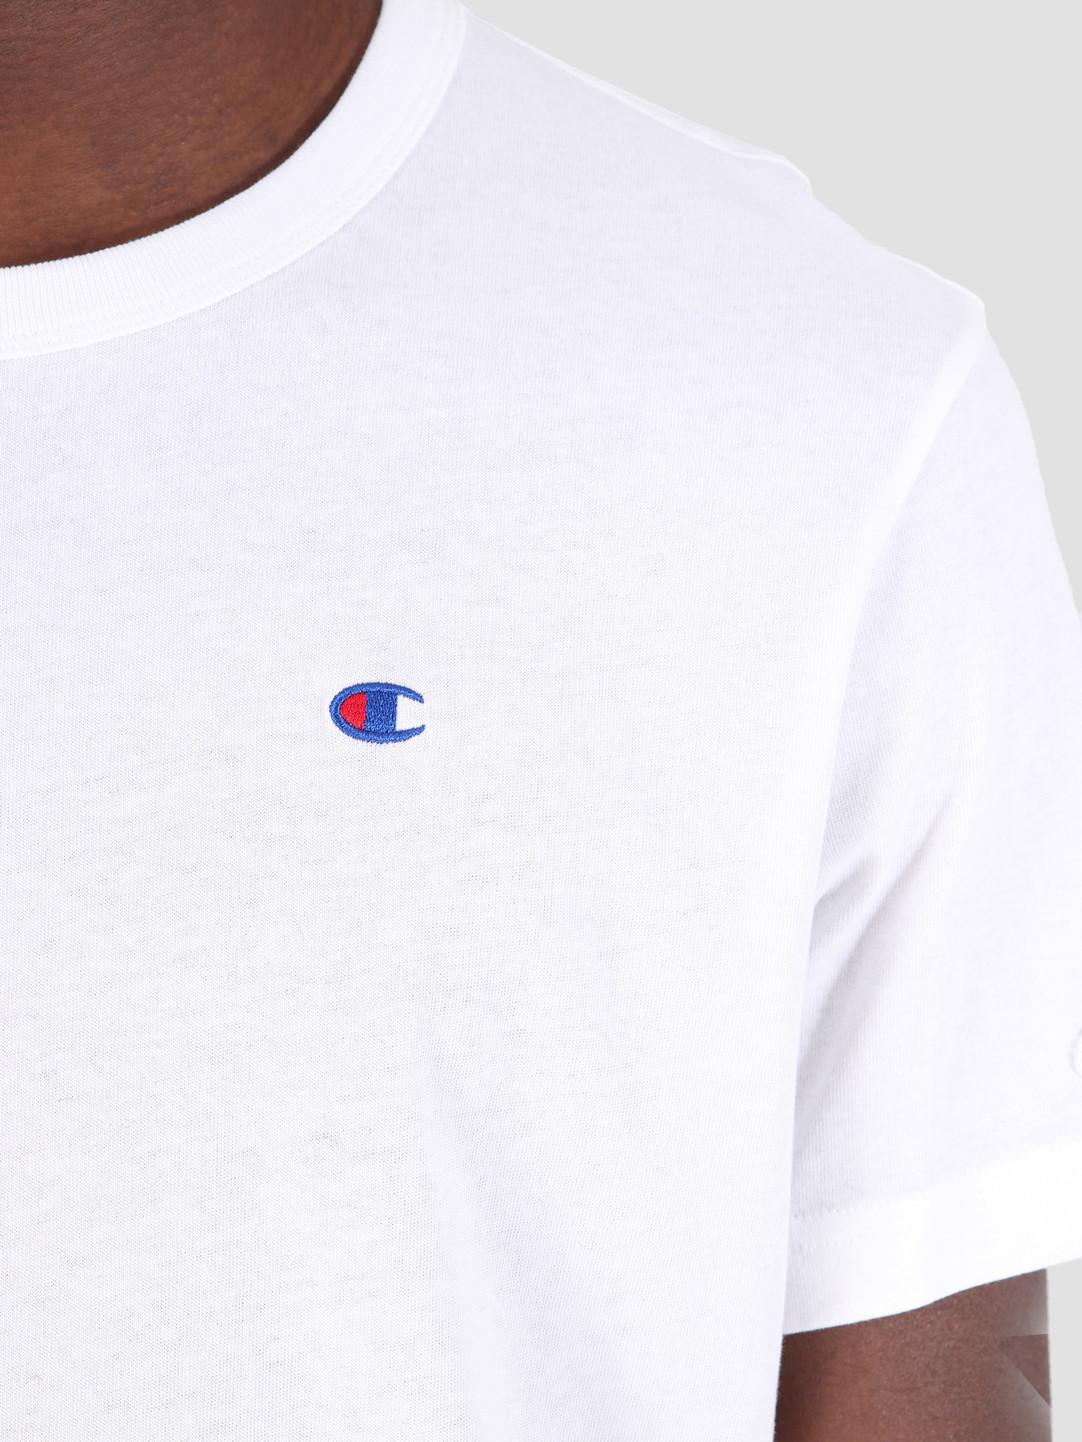 695e84e03ef7 Champion Crewneck T-Shirt WHT 212974 | FRESHCOTTON